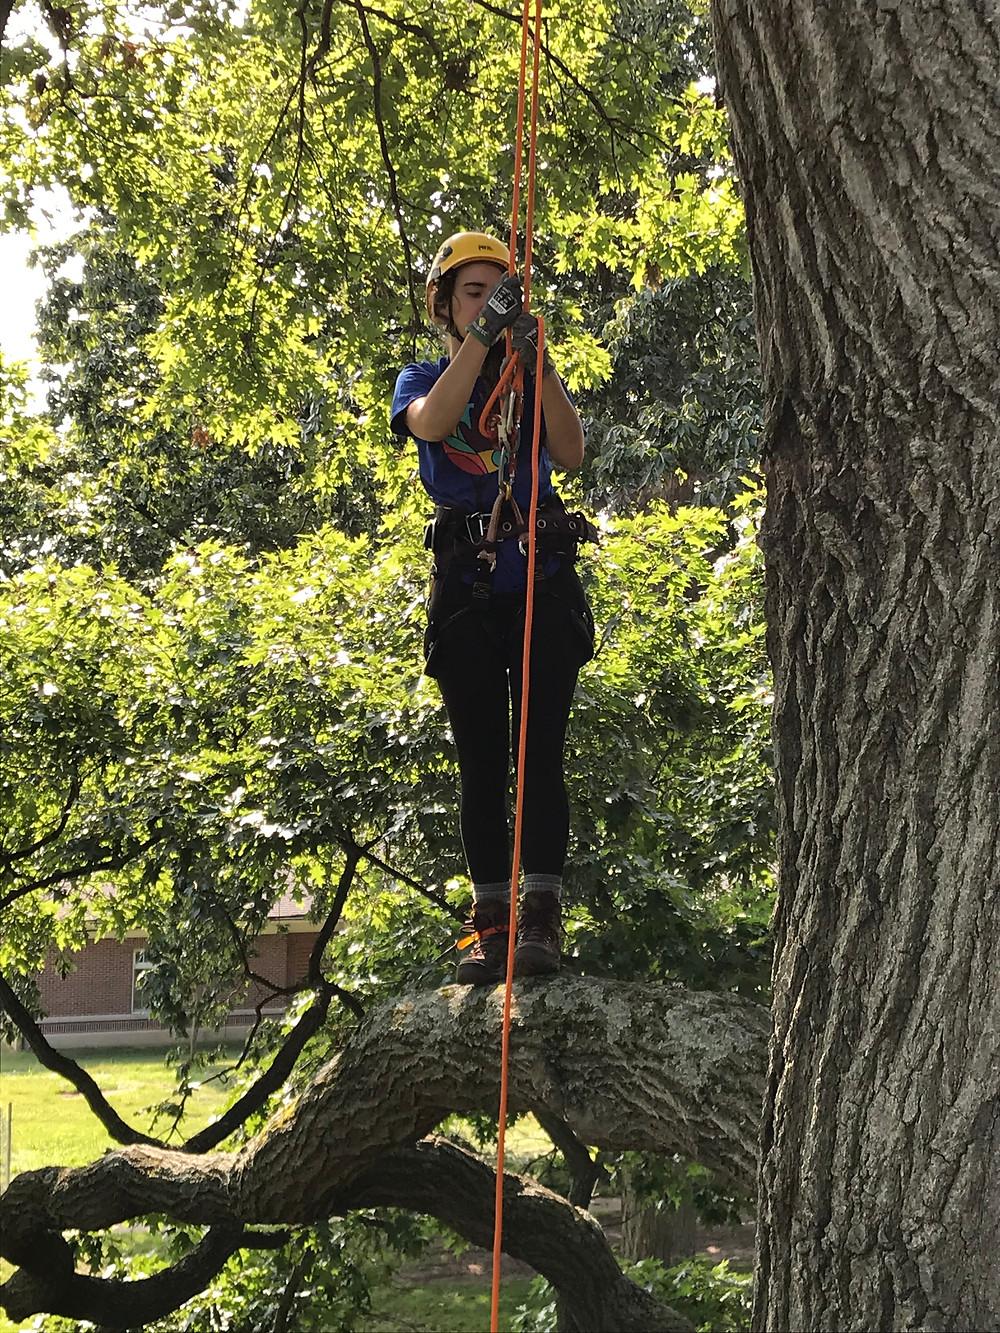 Jenny standing on a tree limb in climbing gear